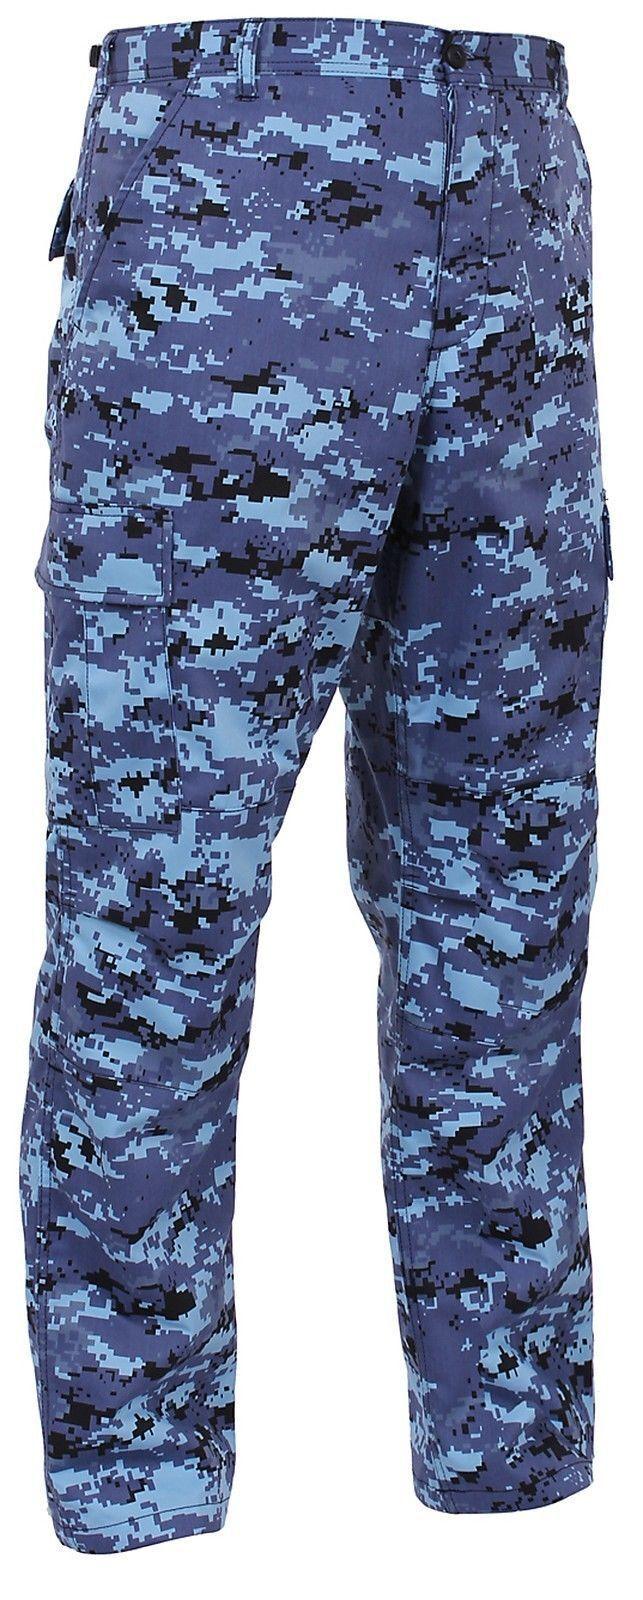 Men's Sky bluee Digital Camo BDU Cargo Pants - Tactical Military Style S - 3XL